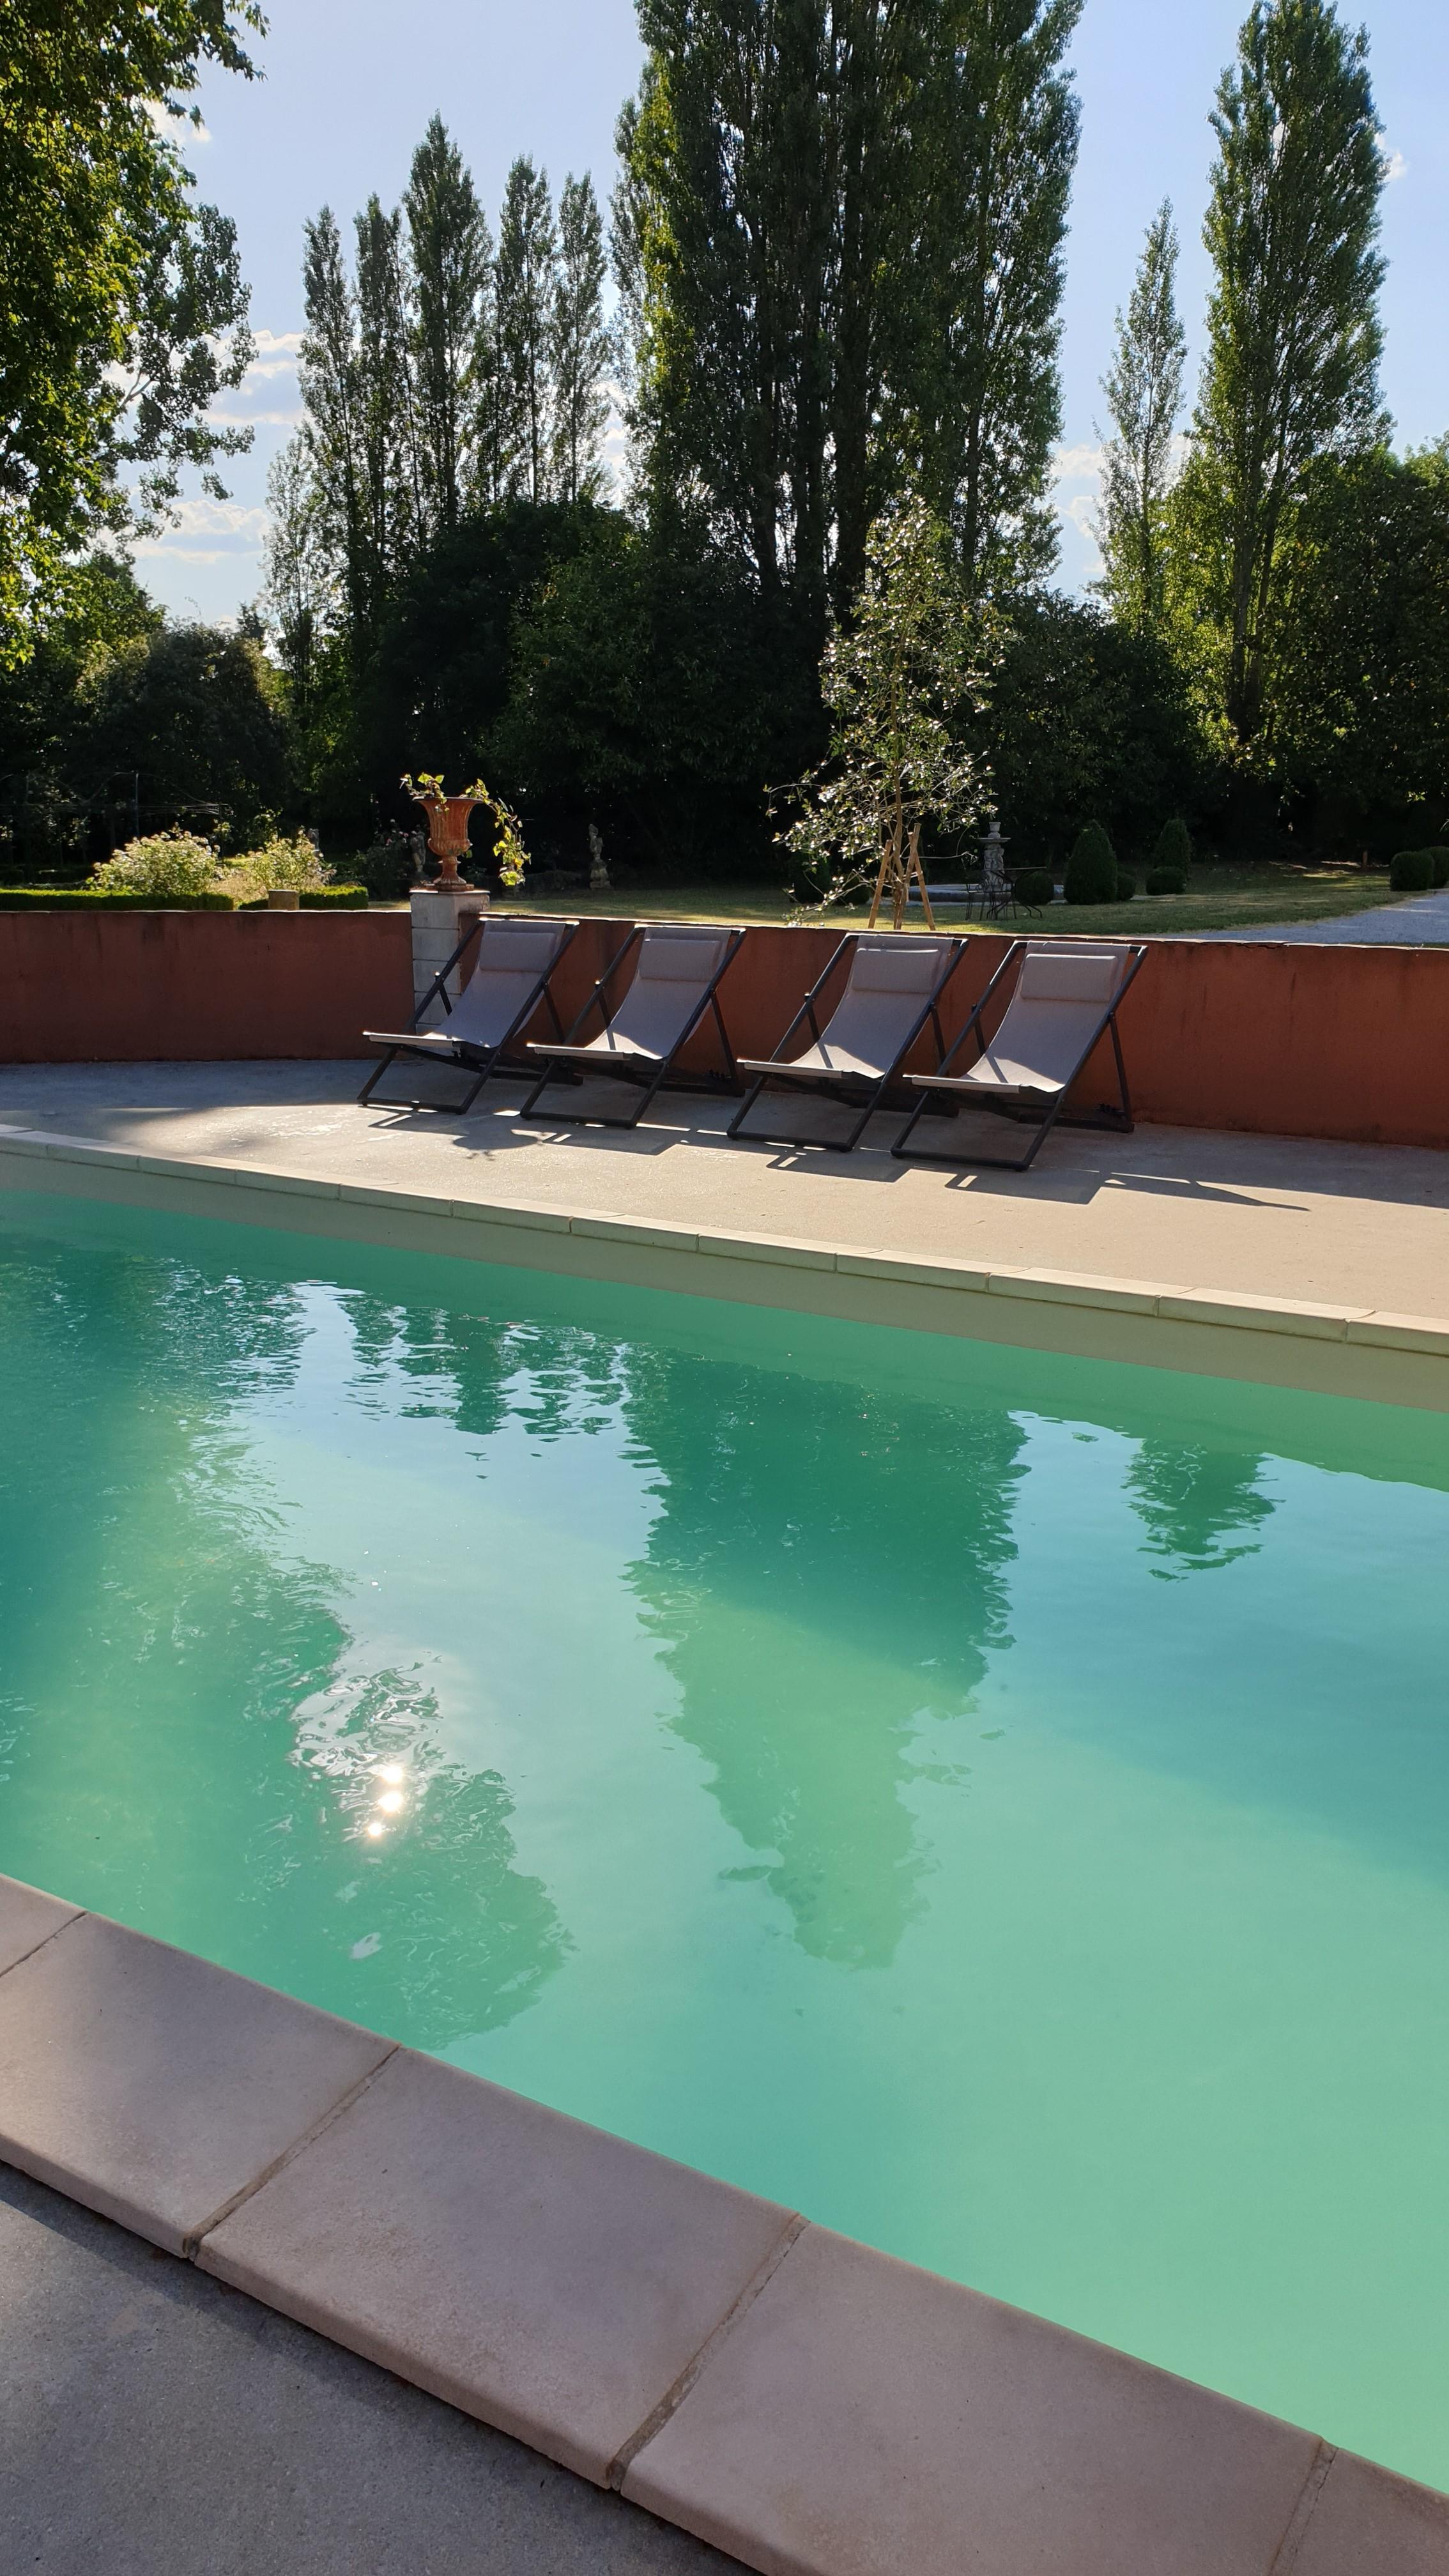 ch-908-e-pool-2-3932